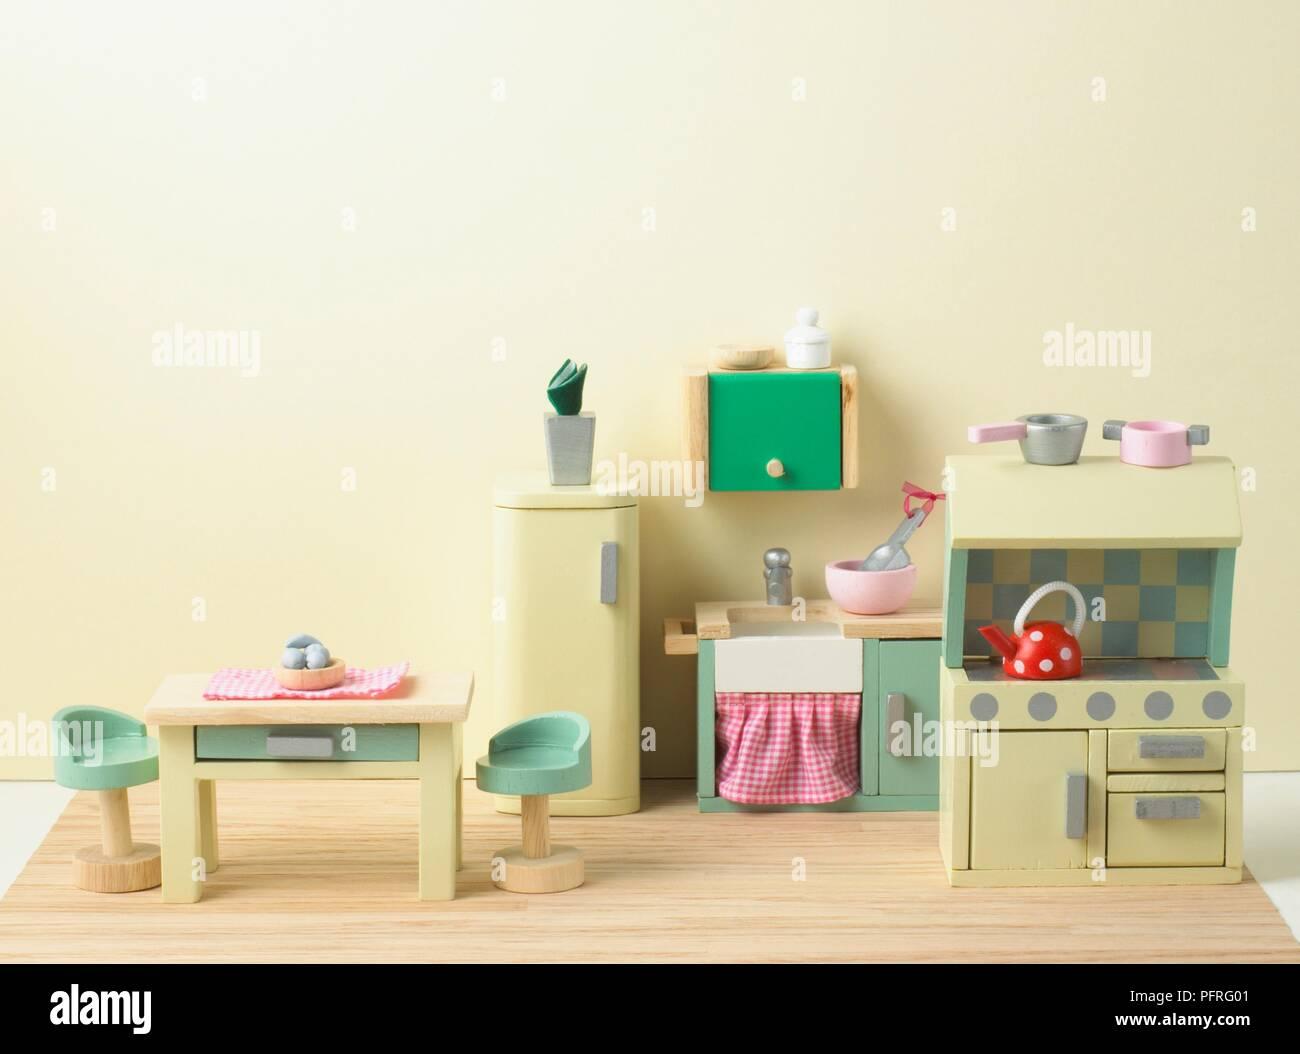 Dollu0027s House Kitchen   Stock Image